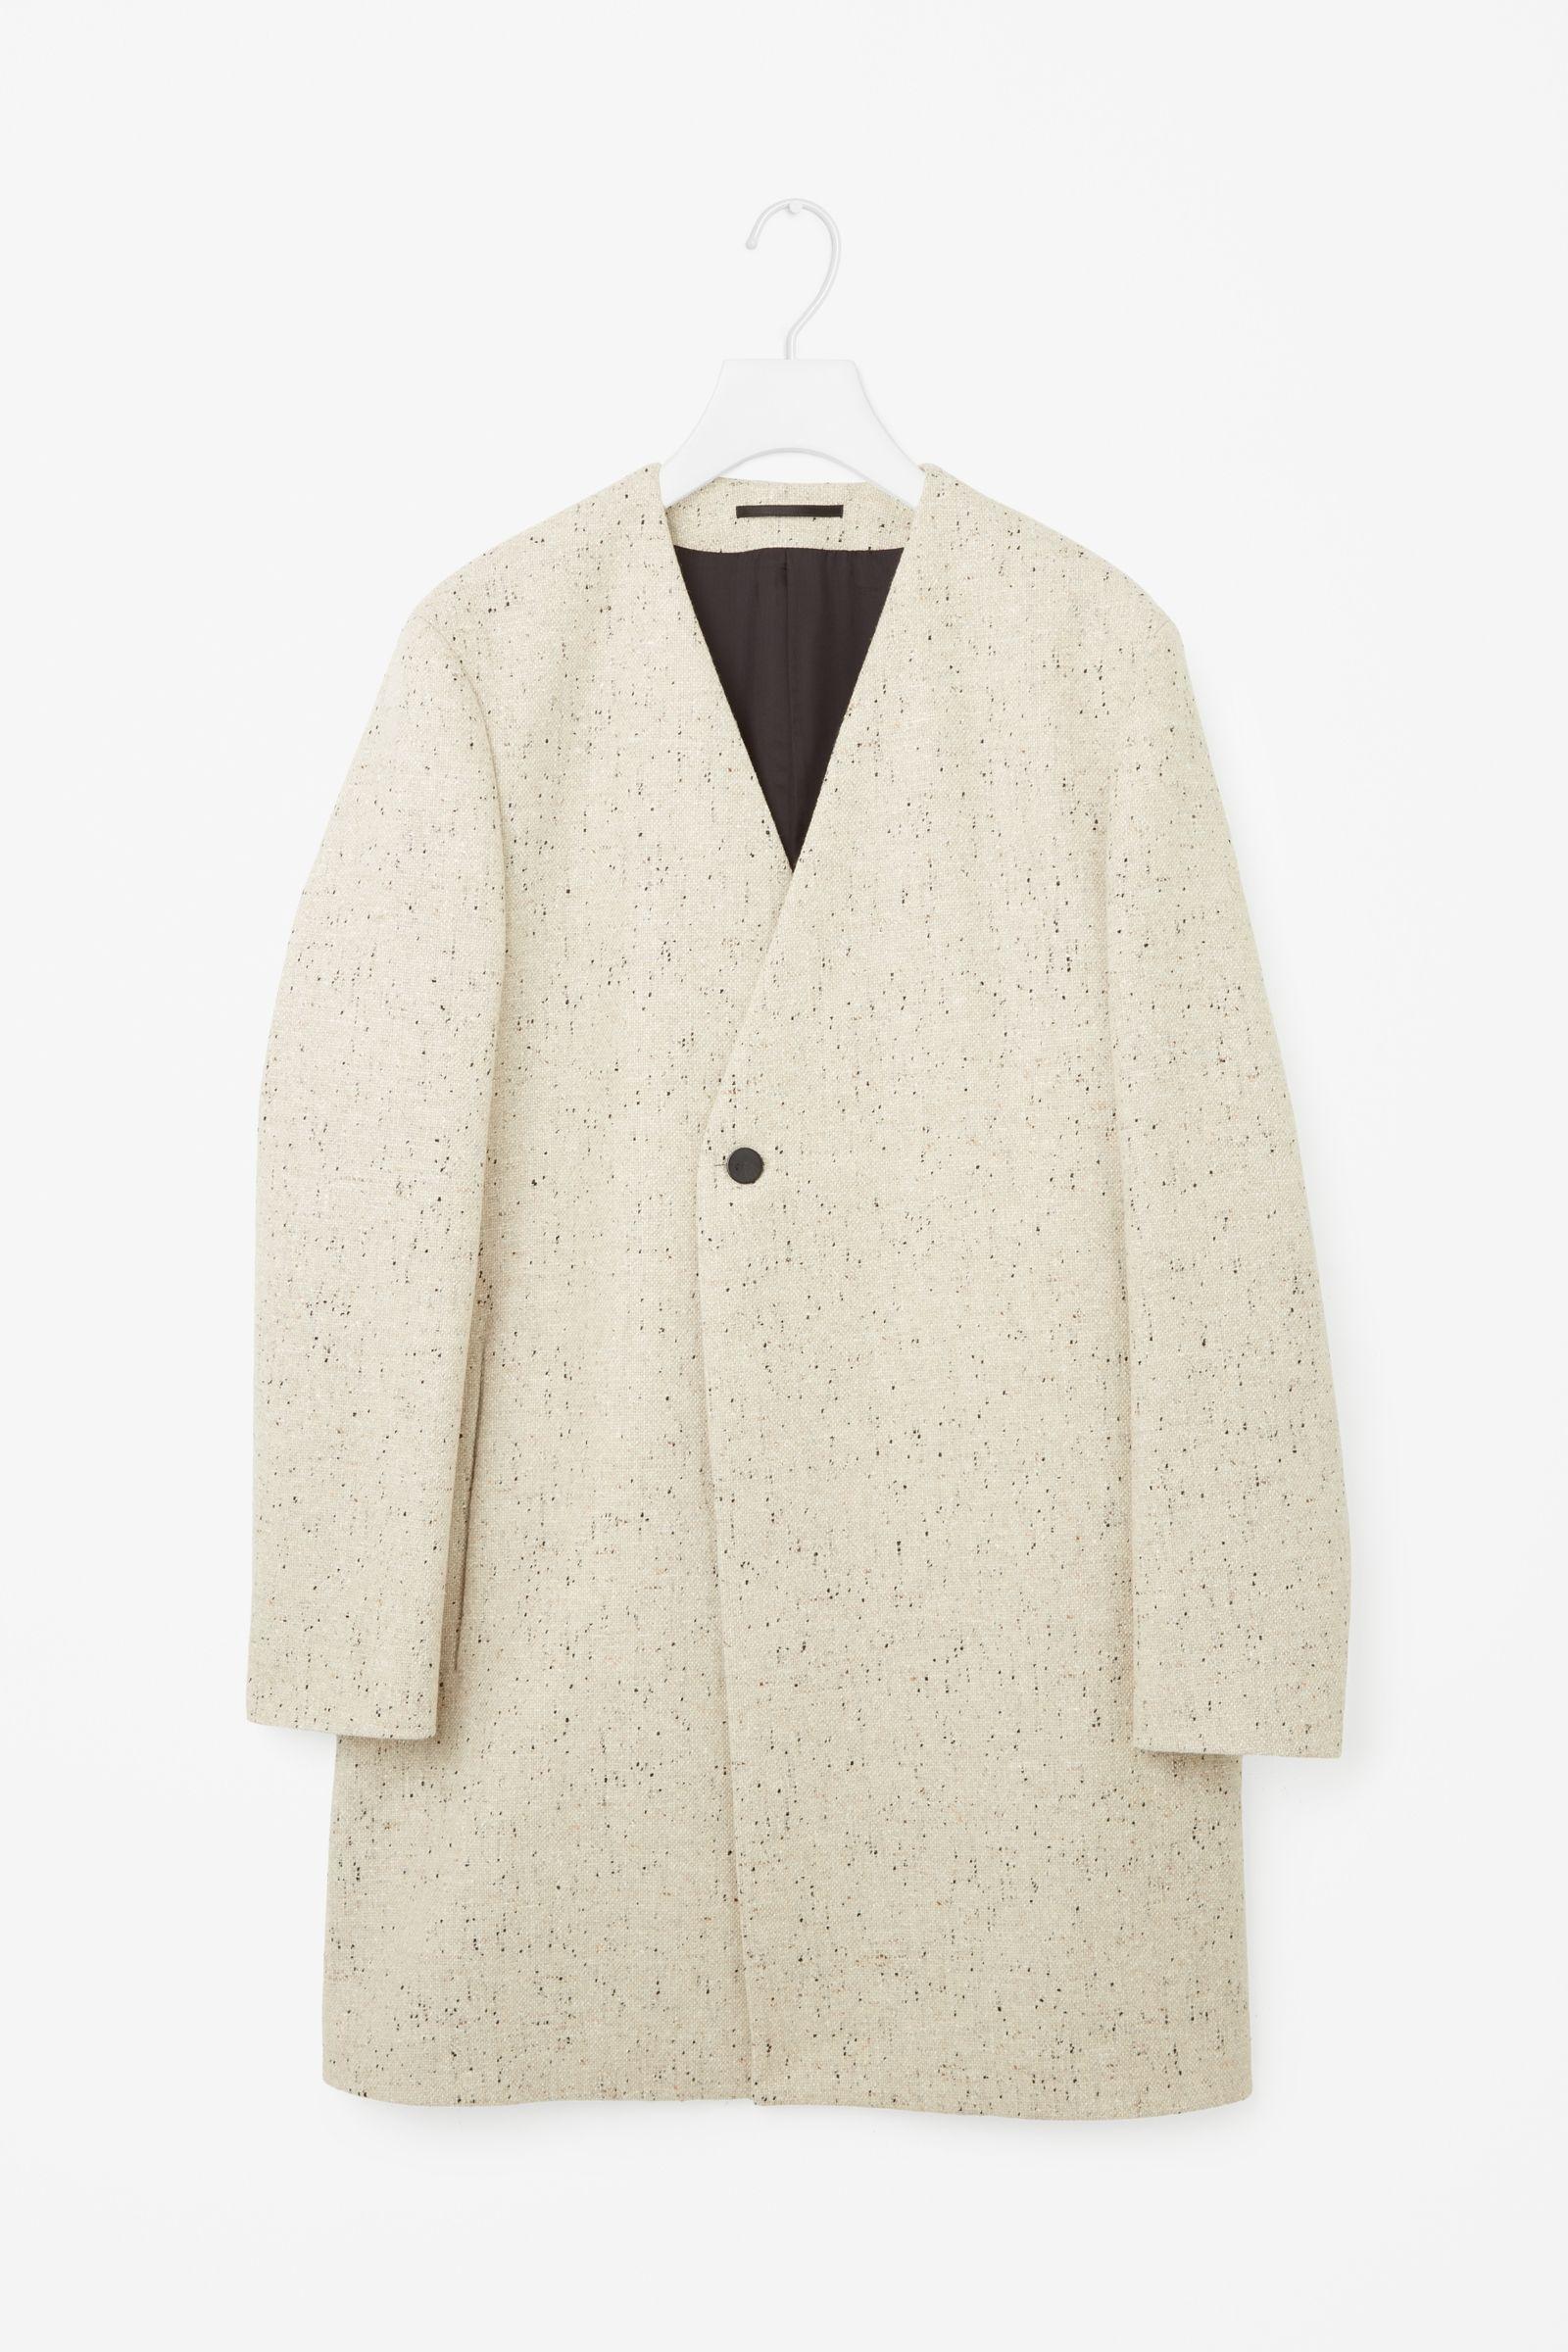 Essentials Coat Cos Melange Collarless Pinterest Wishlist tE1zBFwzq